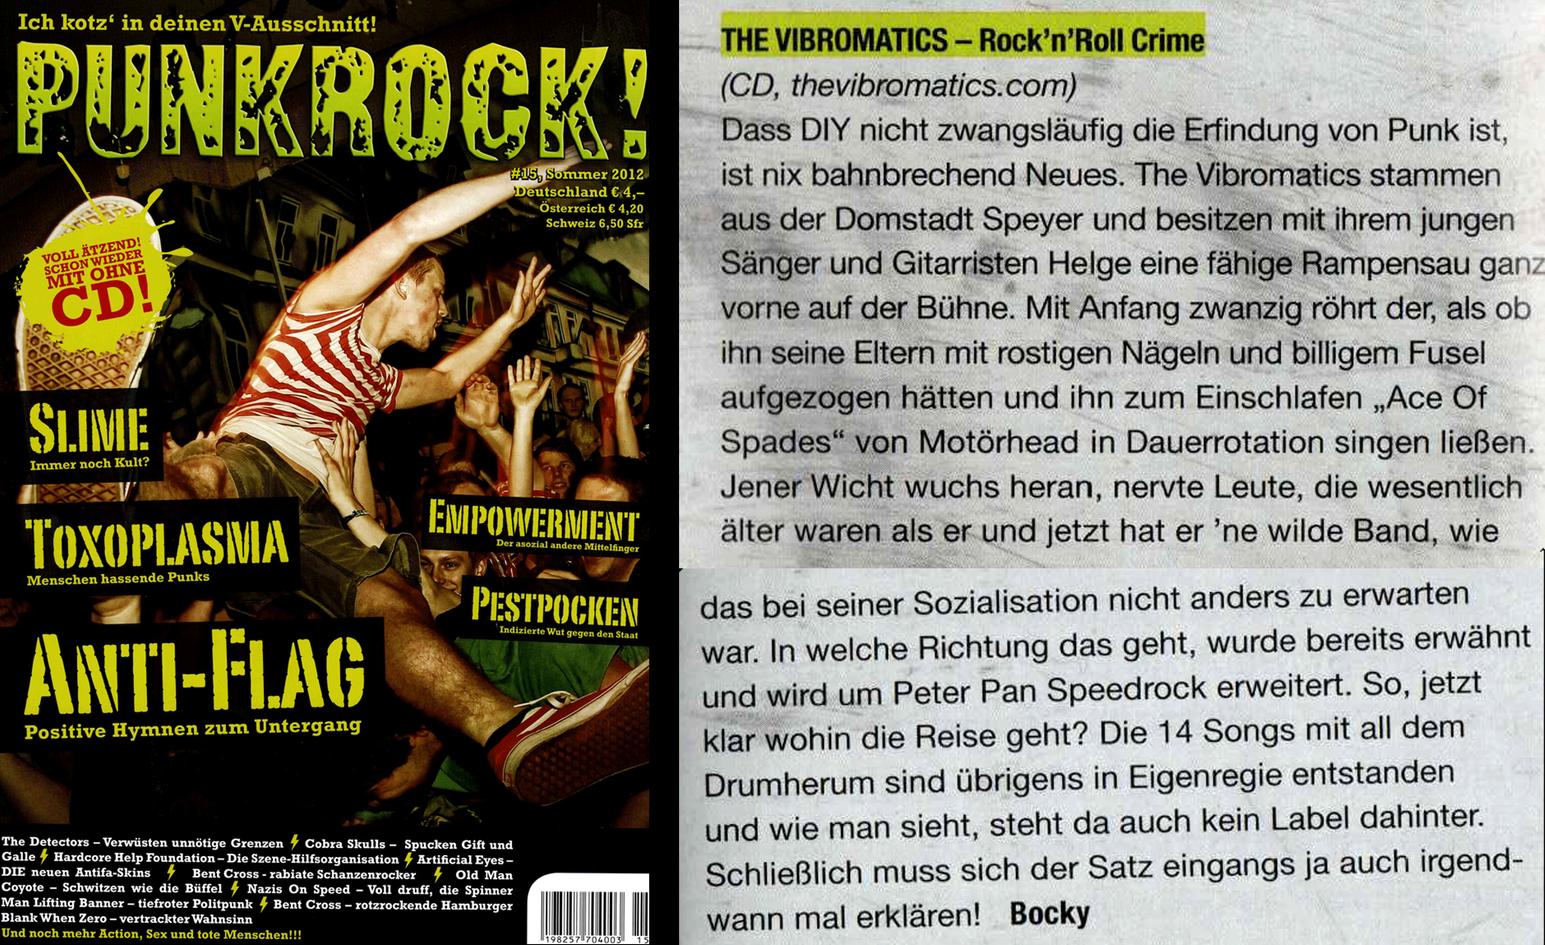 The Vibromatics - Review PUNKROCK 2012